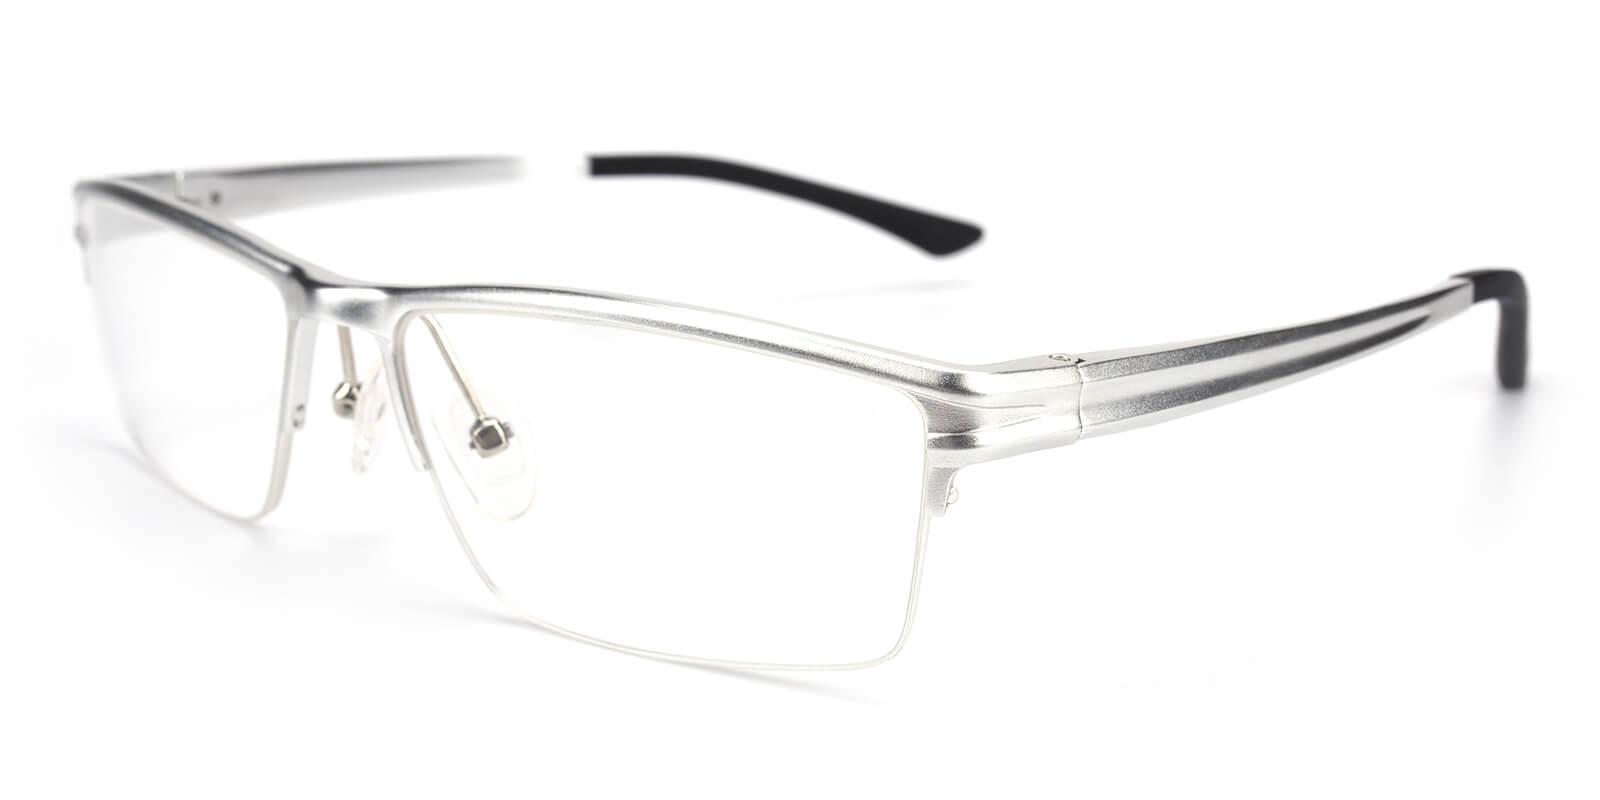 Leonado-Silver-Rectangle-Metal-Eyeglasses-additional1